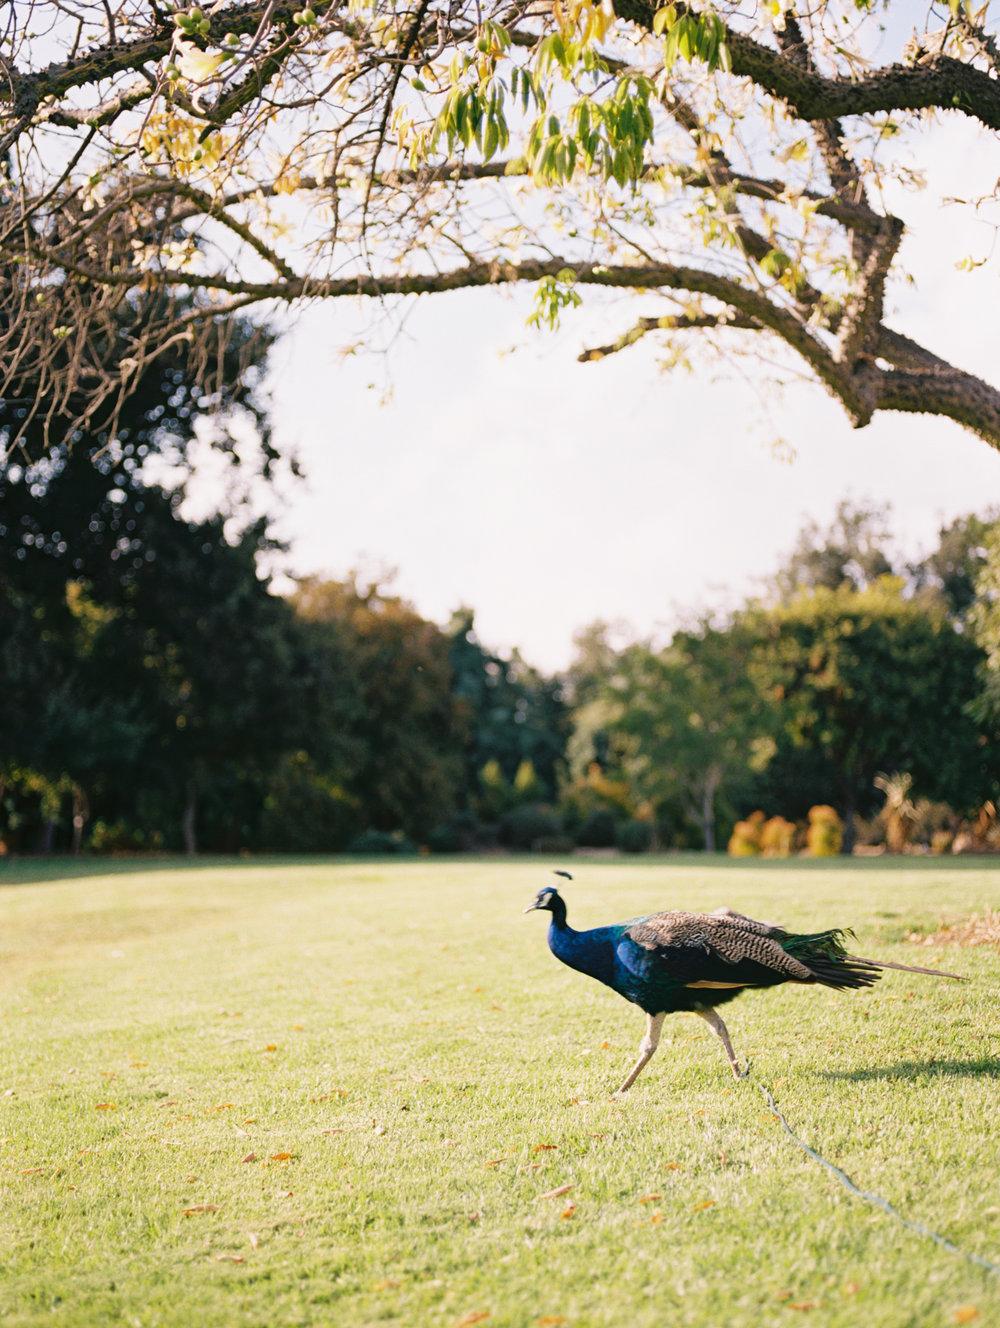 los-angeles-county-arboretum-and-botanic-garden-wedding-photos-photography309.jpg